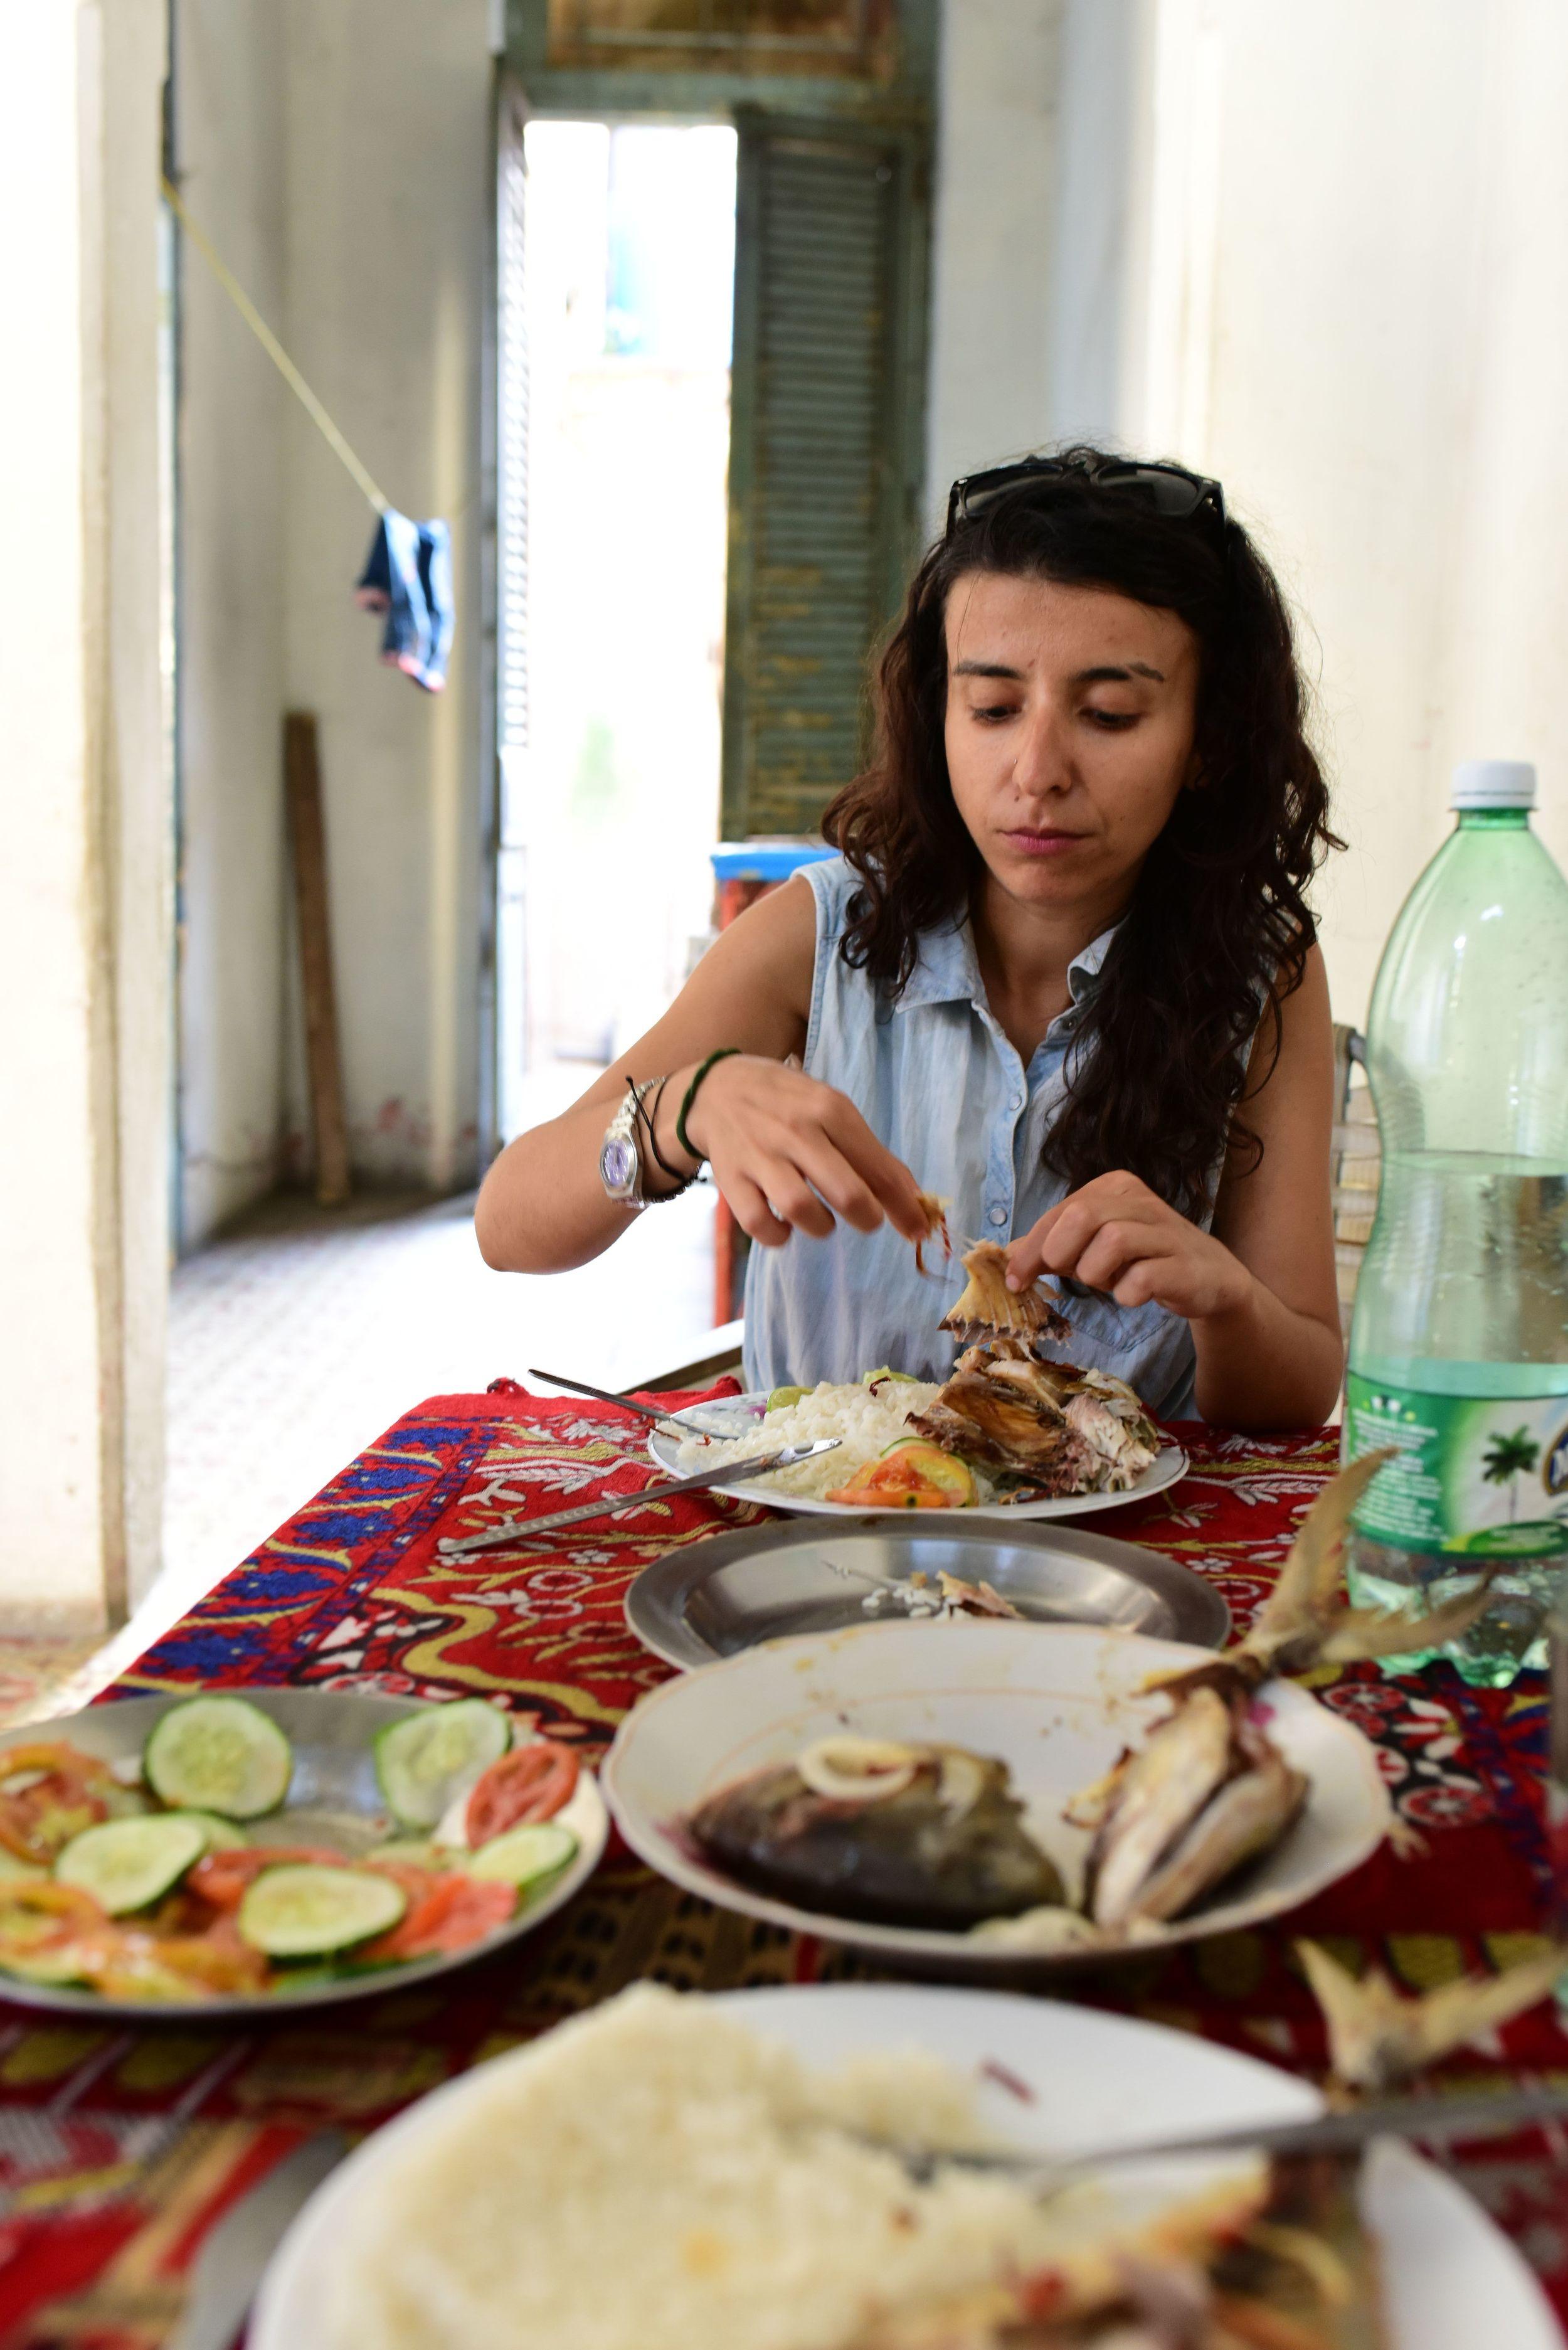 pranz cubanez